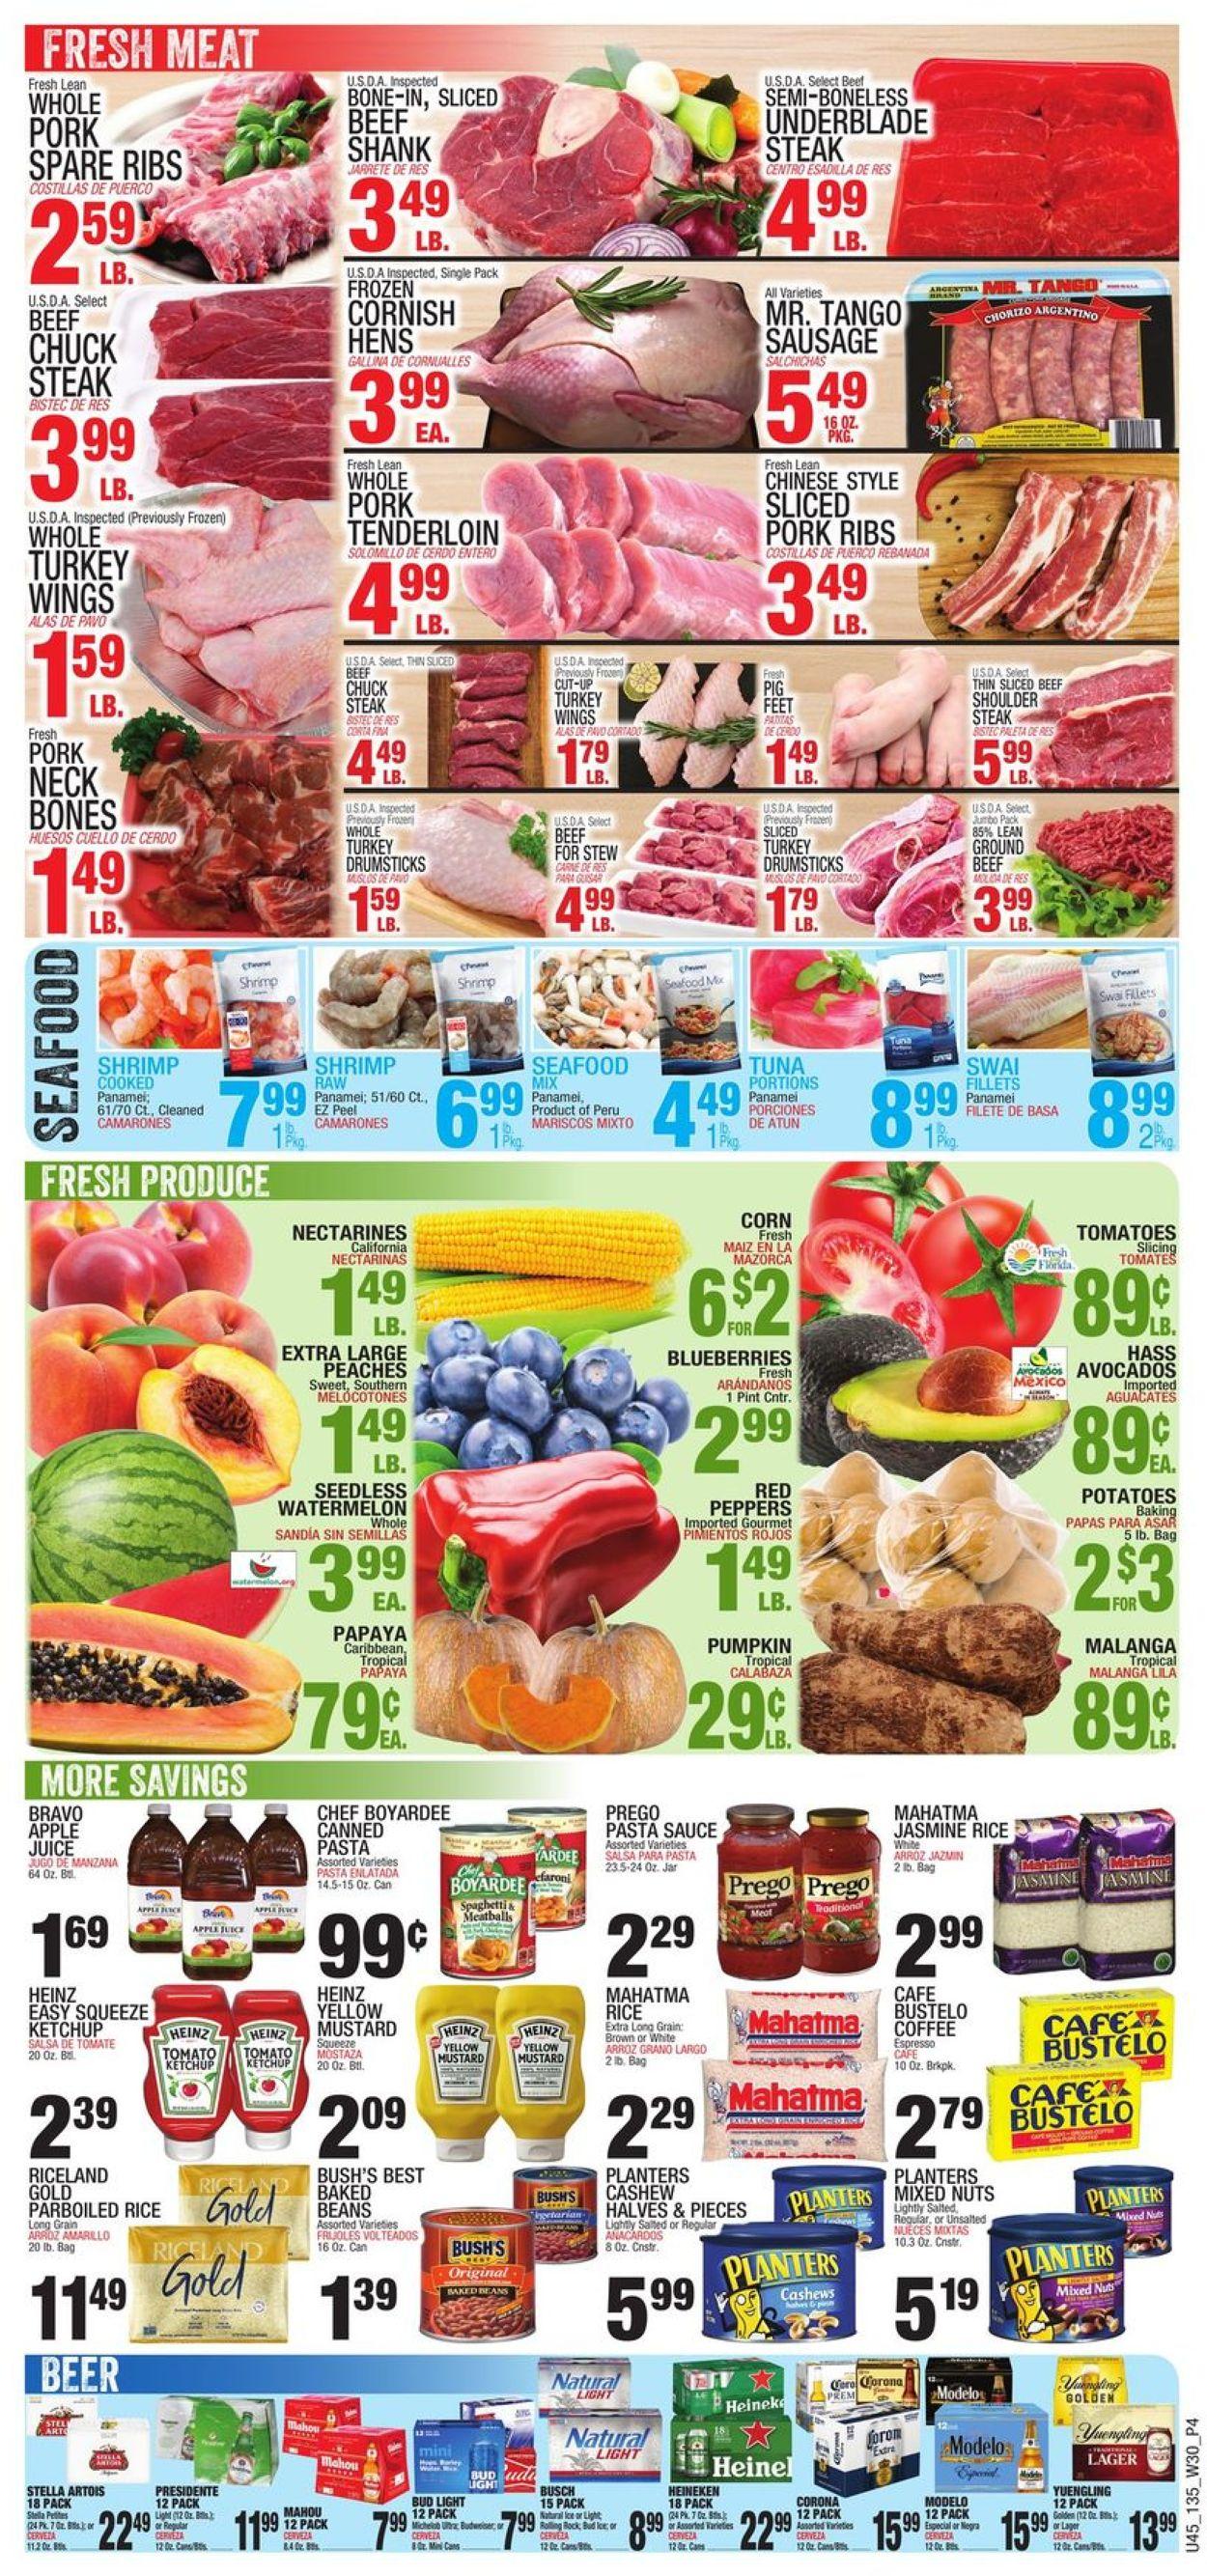 Bravo Supermarkets Weekly Ad Circular - valid 07/22-07/28/2021 (Page 4)